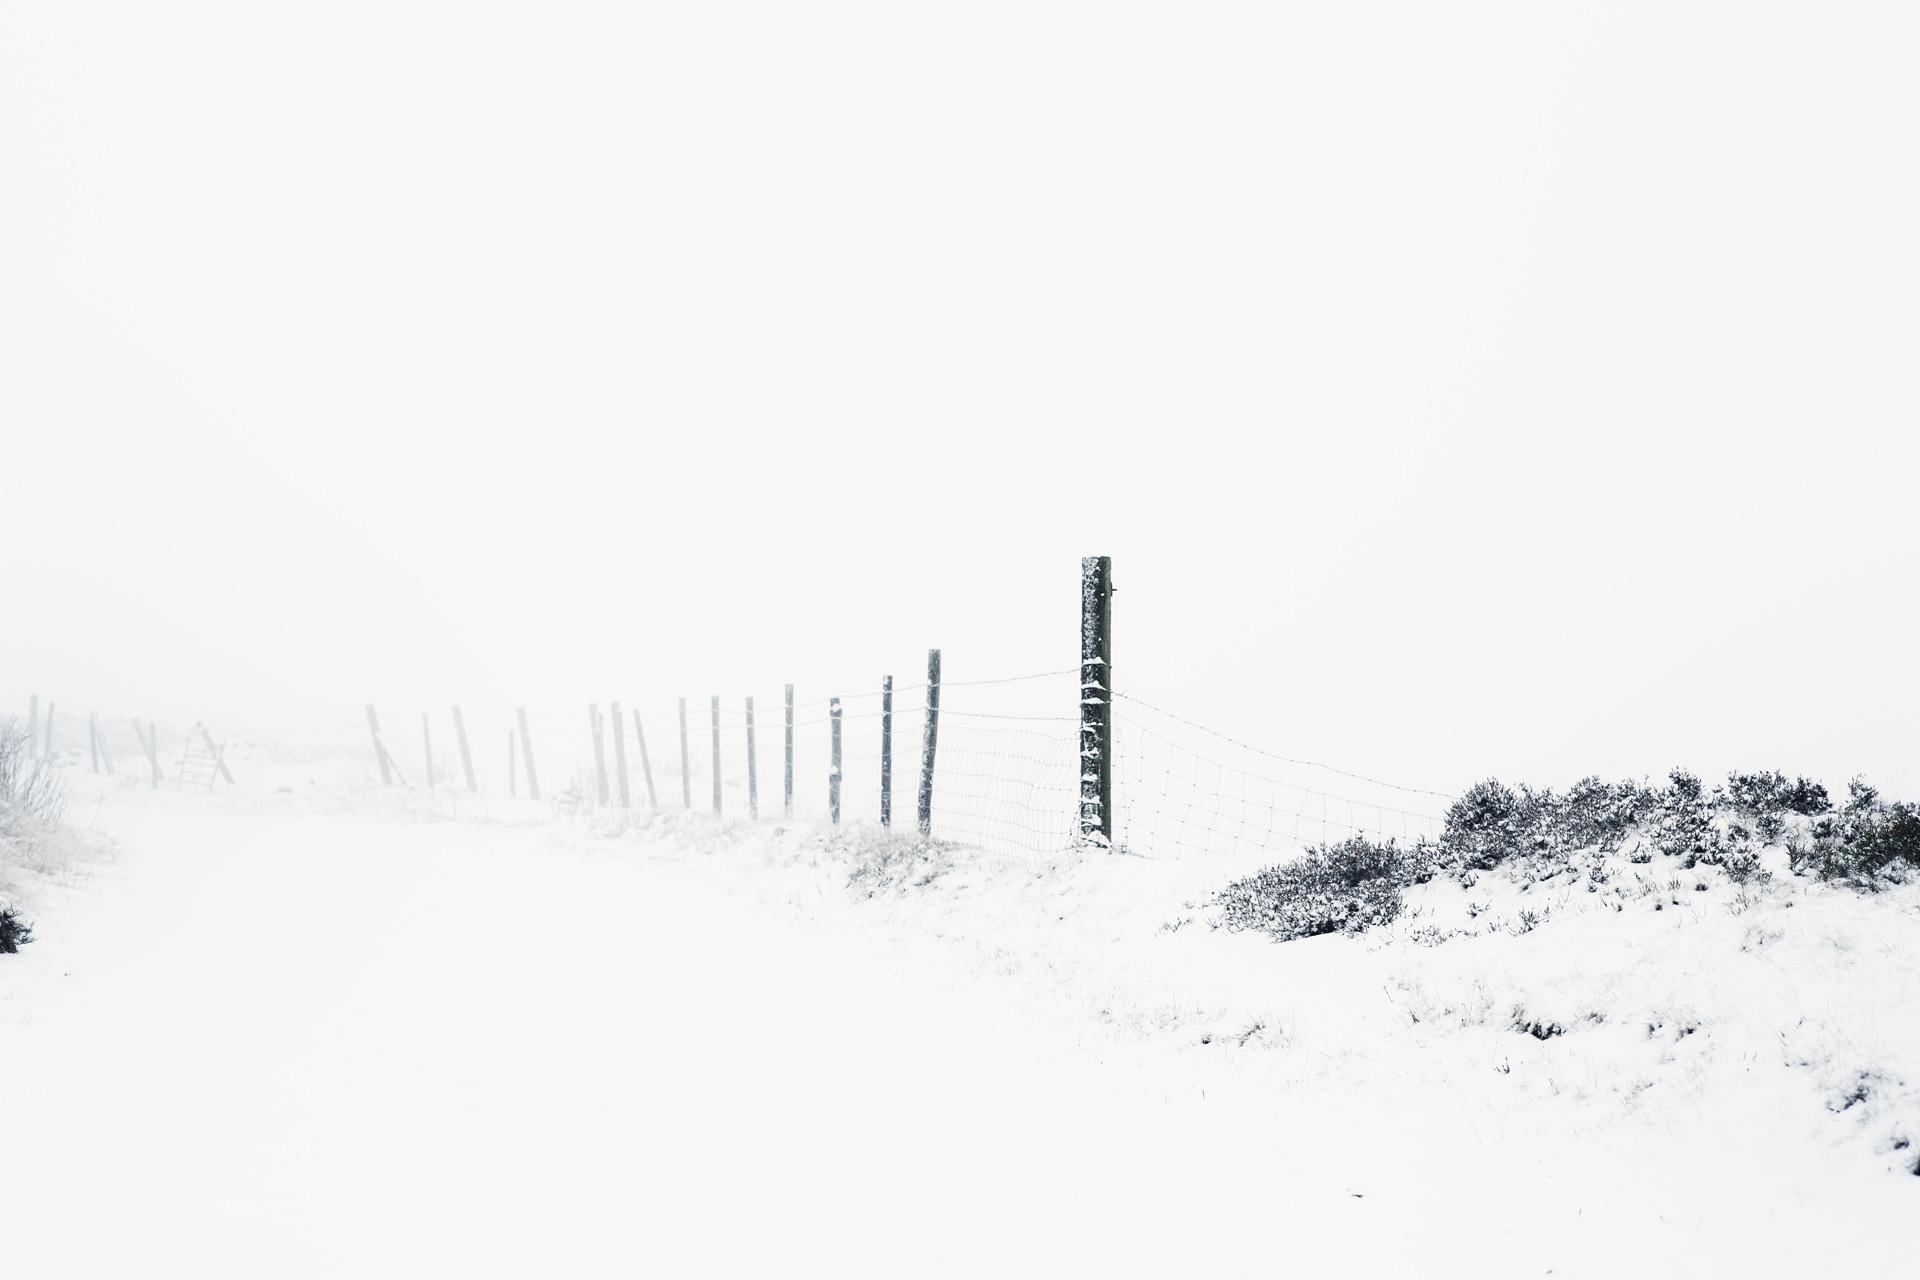 arc_snow_05